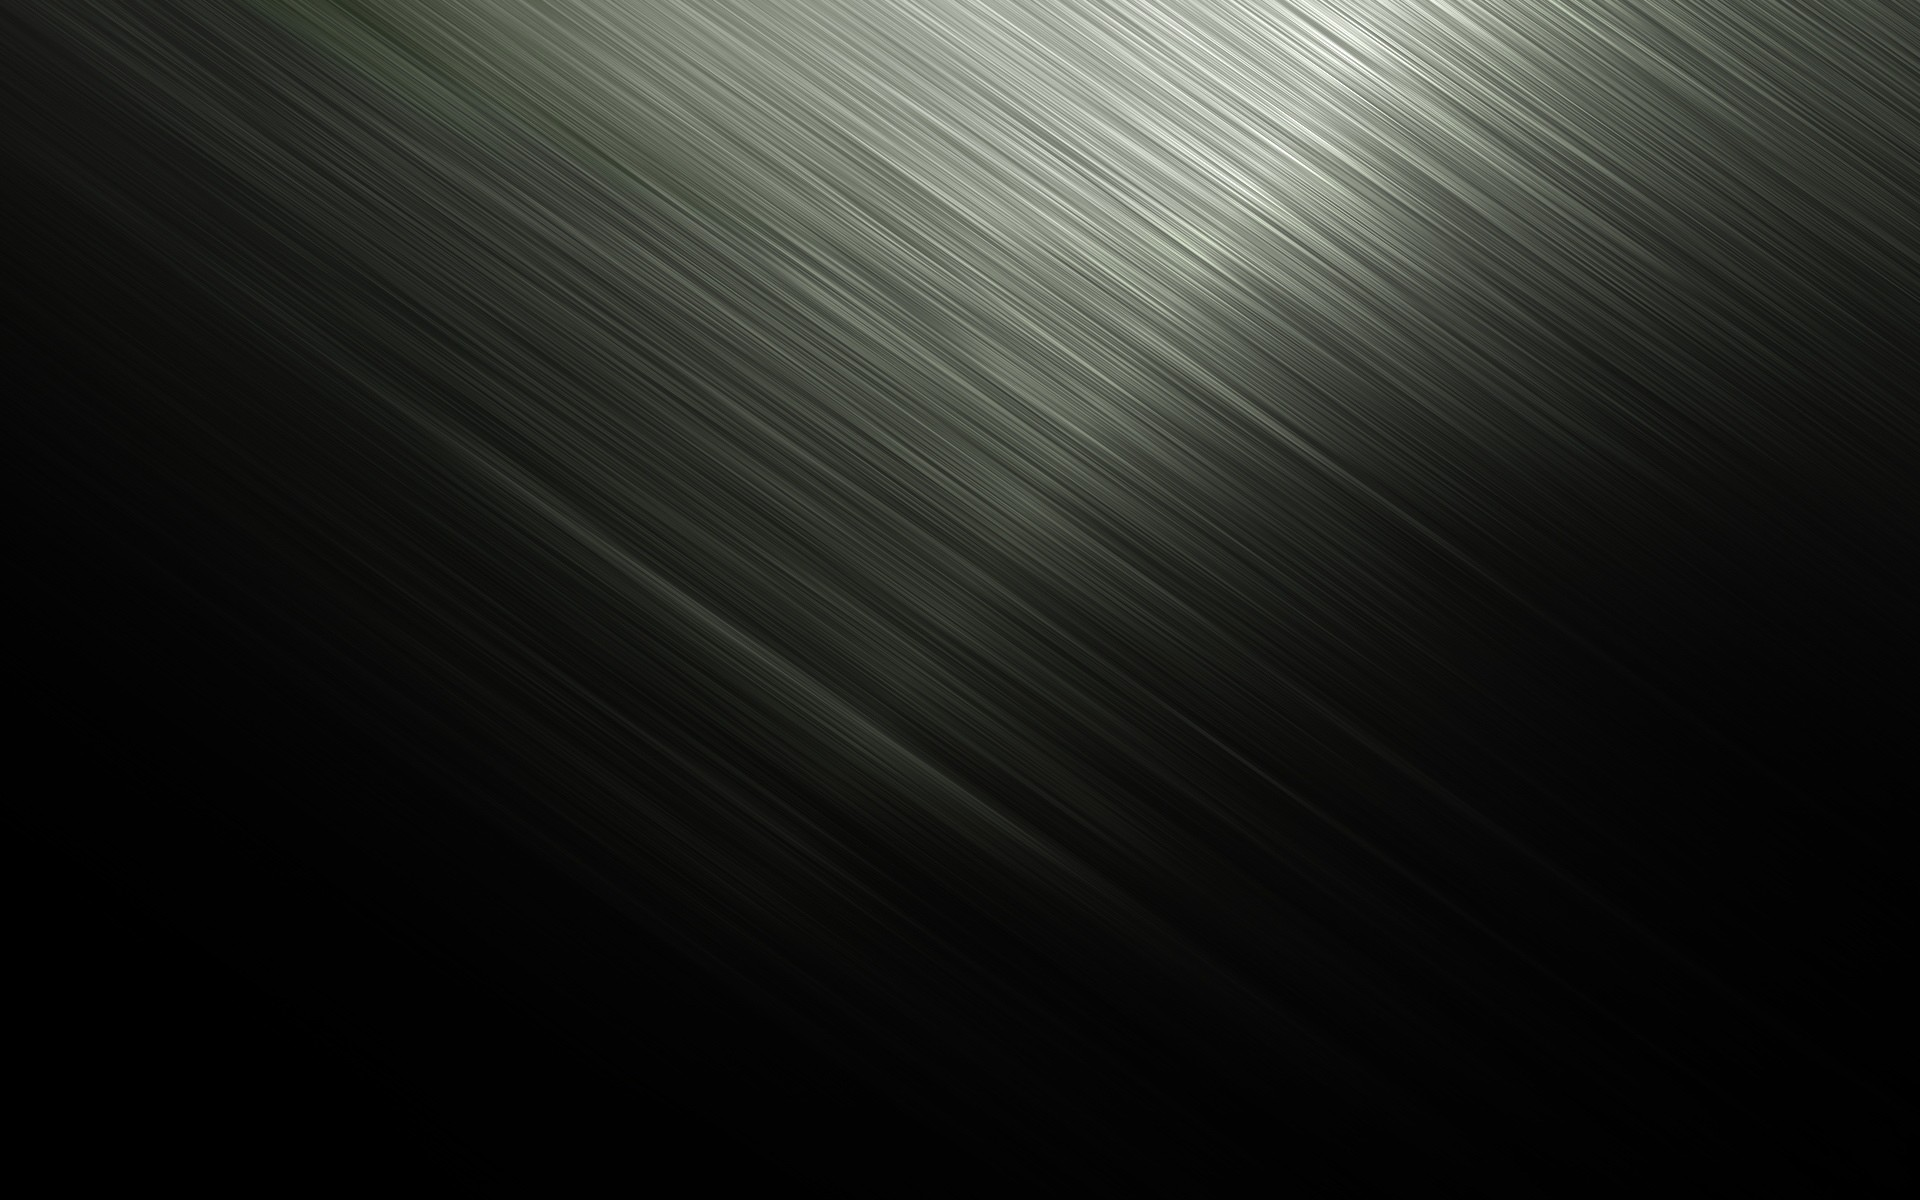 Abstract Black Wallpaper 1920x1200 Abstract Black 1920x1200